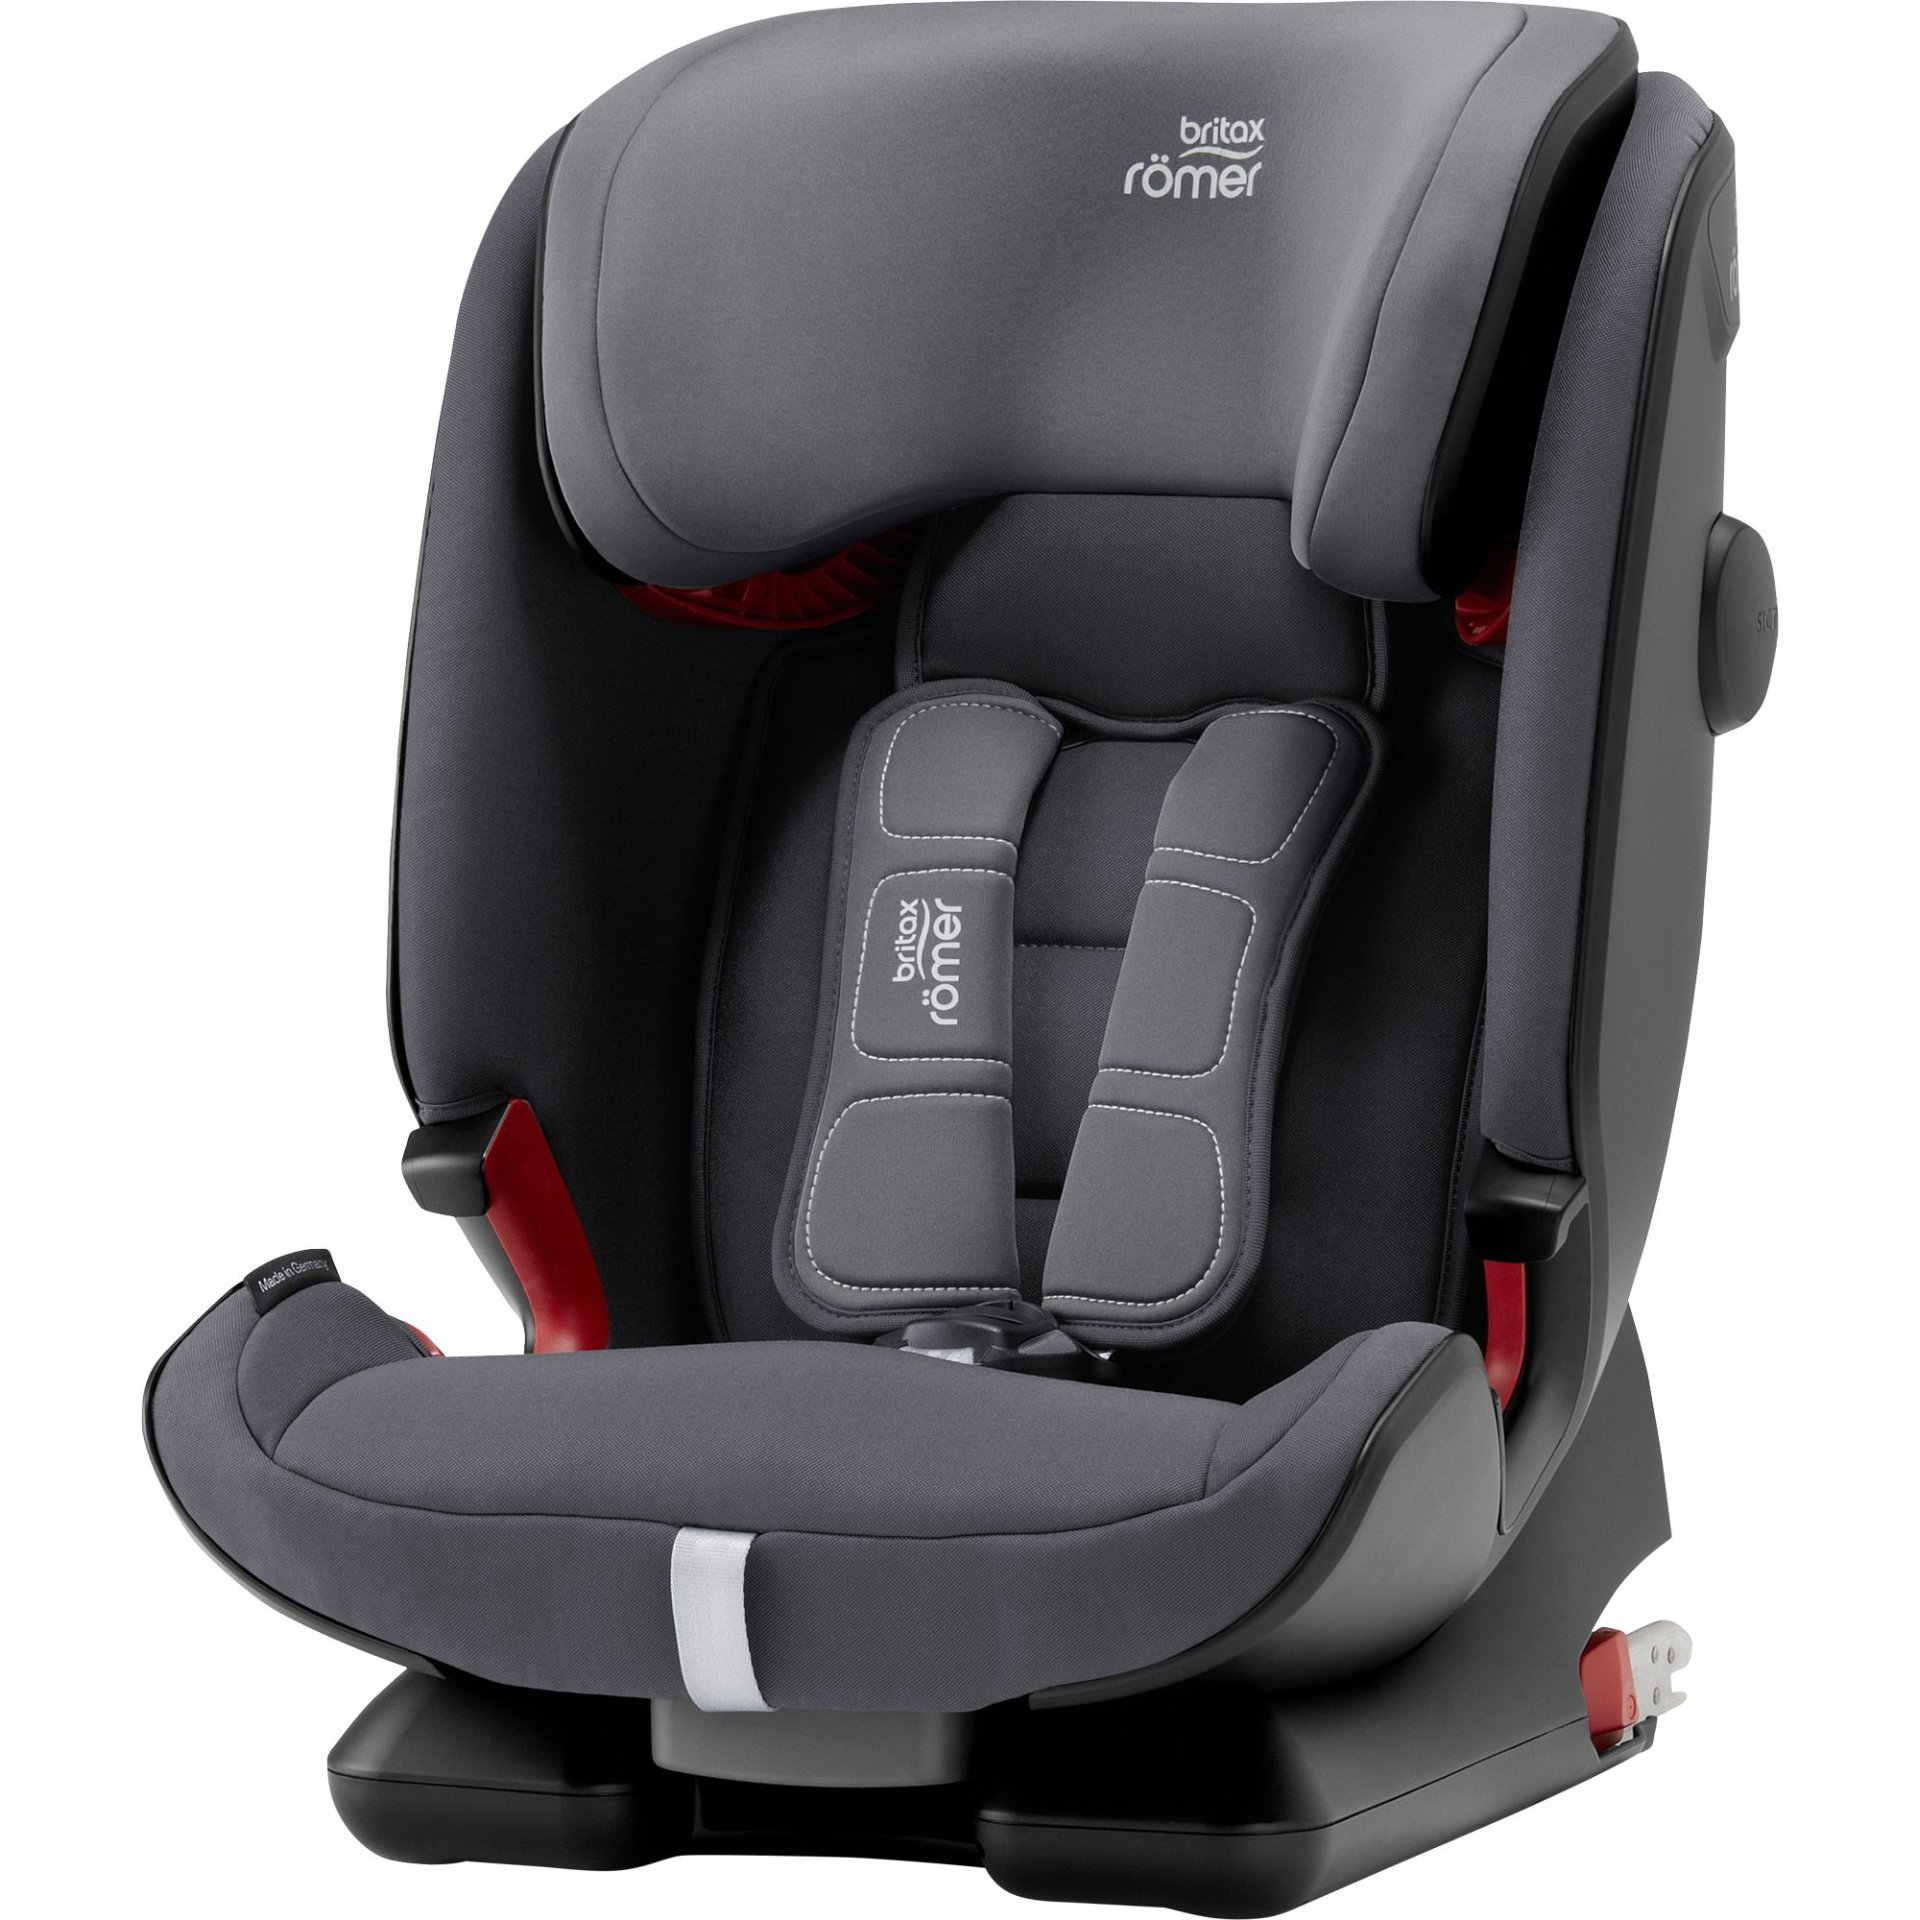 Britax Romer Child Car Seat Advansafix Iv R Storm Grey 2019 Large Image 1